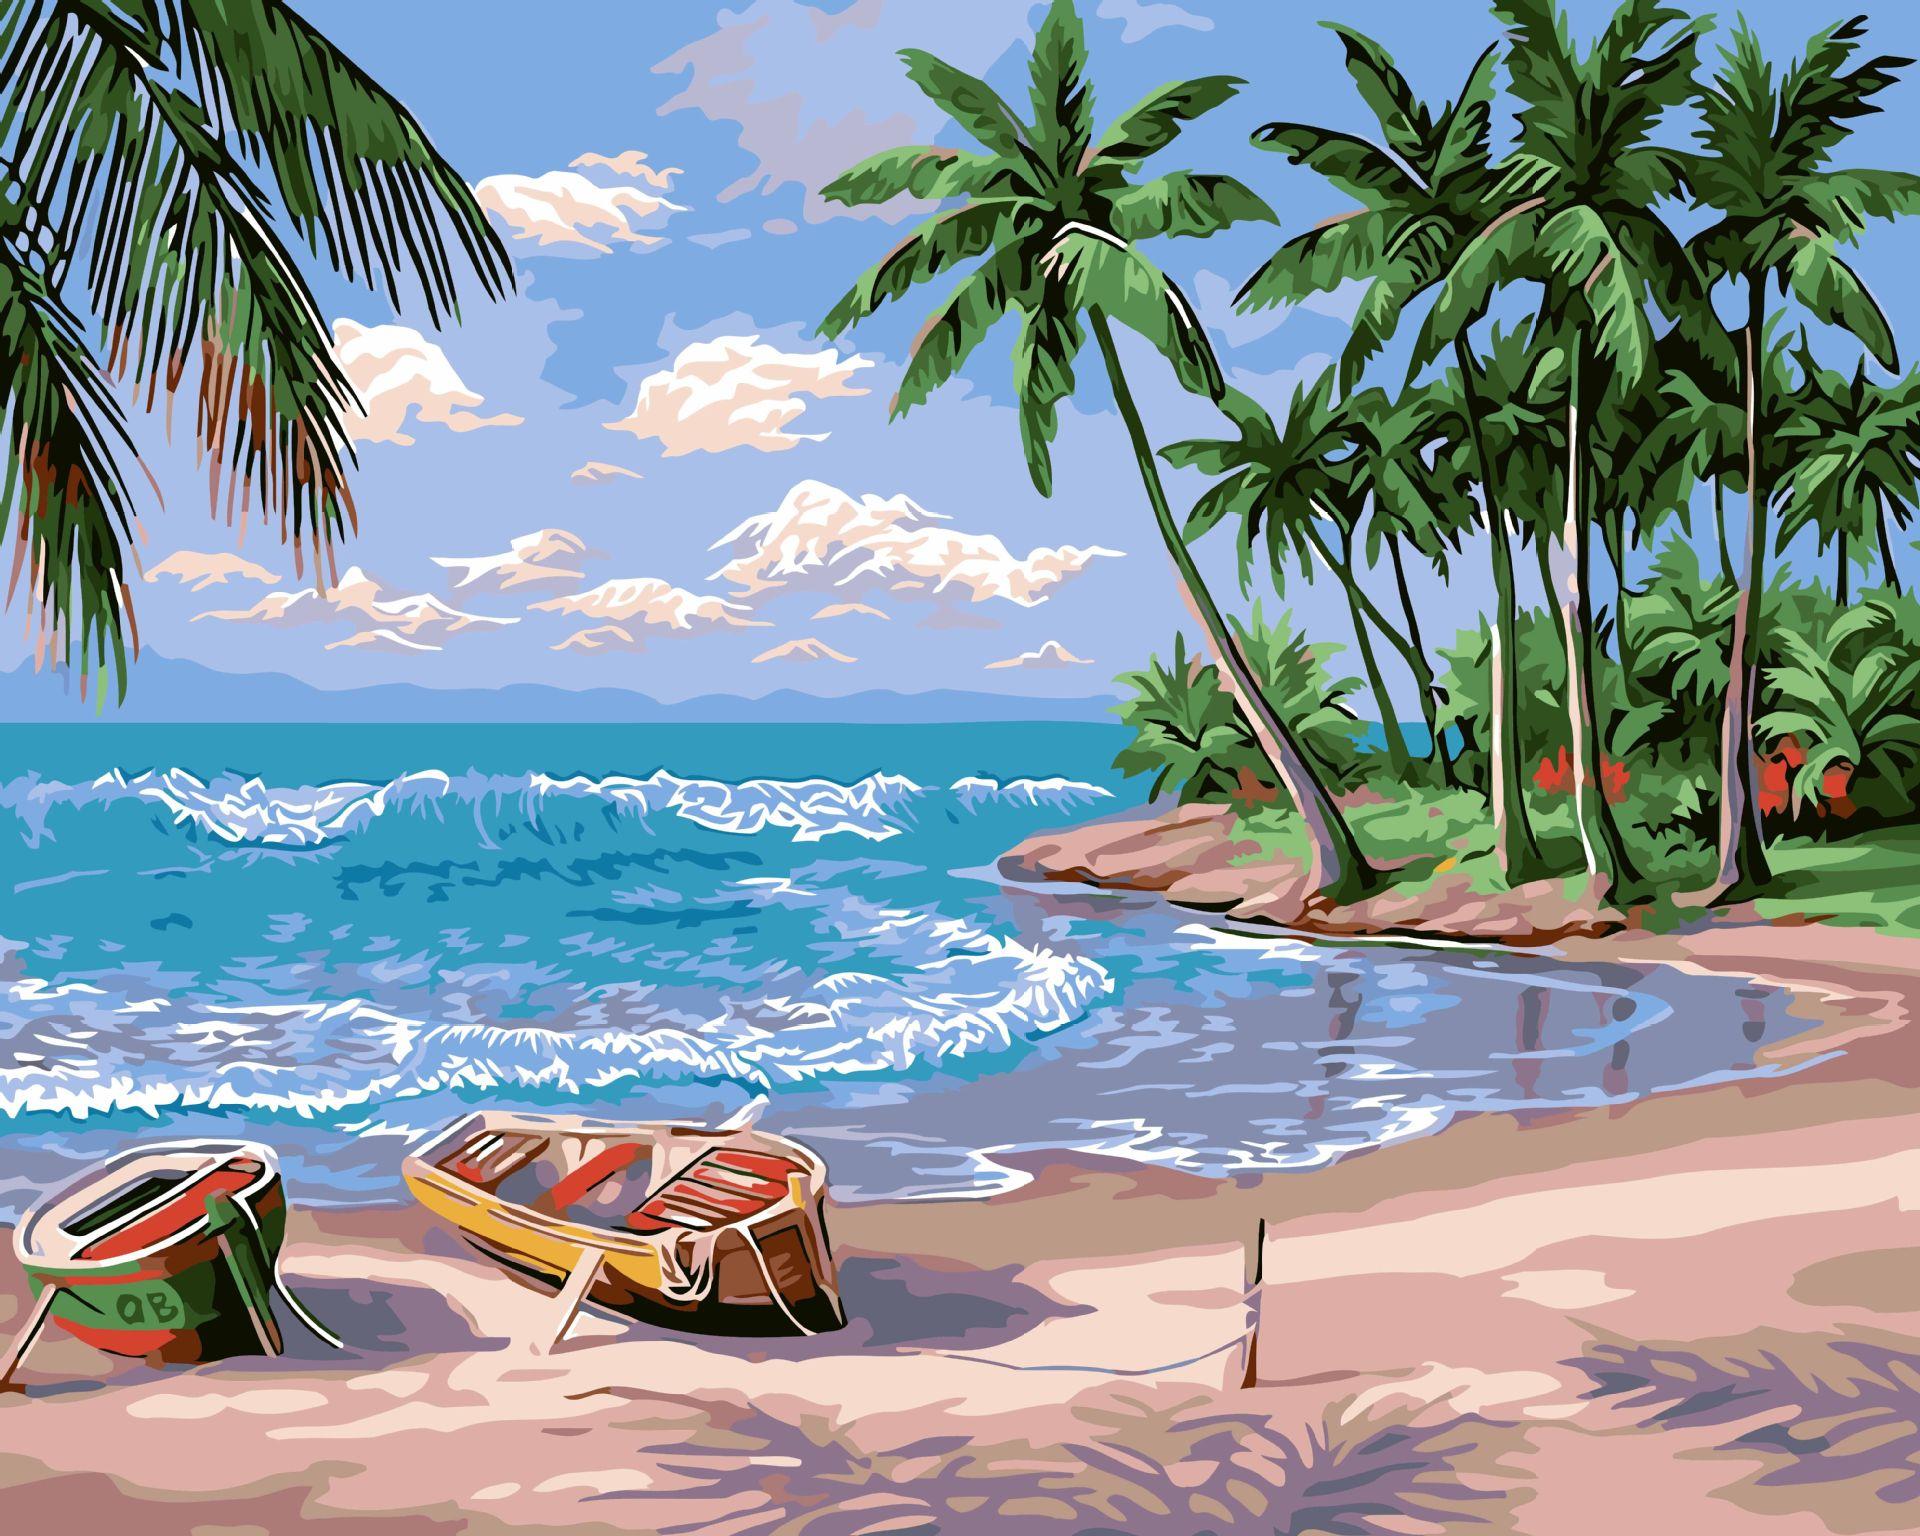 Frameless beach boat seascape oil paintings by numbers diy for Paesaggi marini dipinti